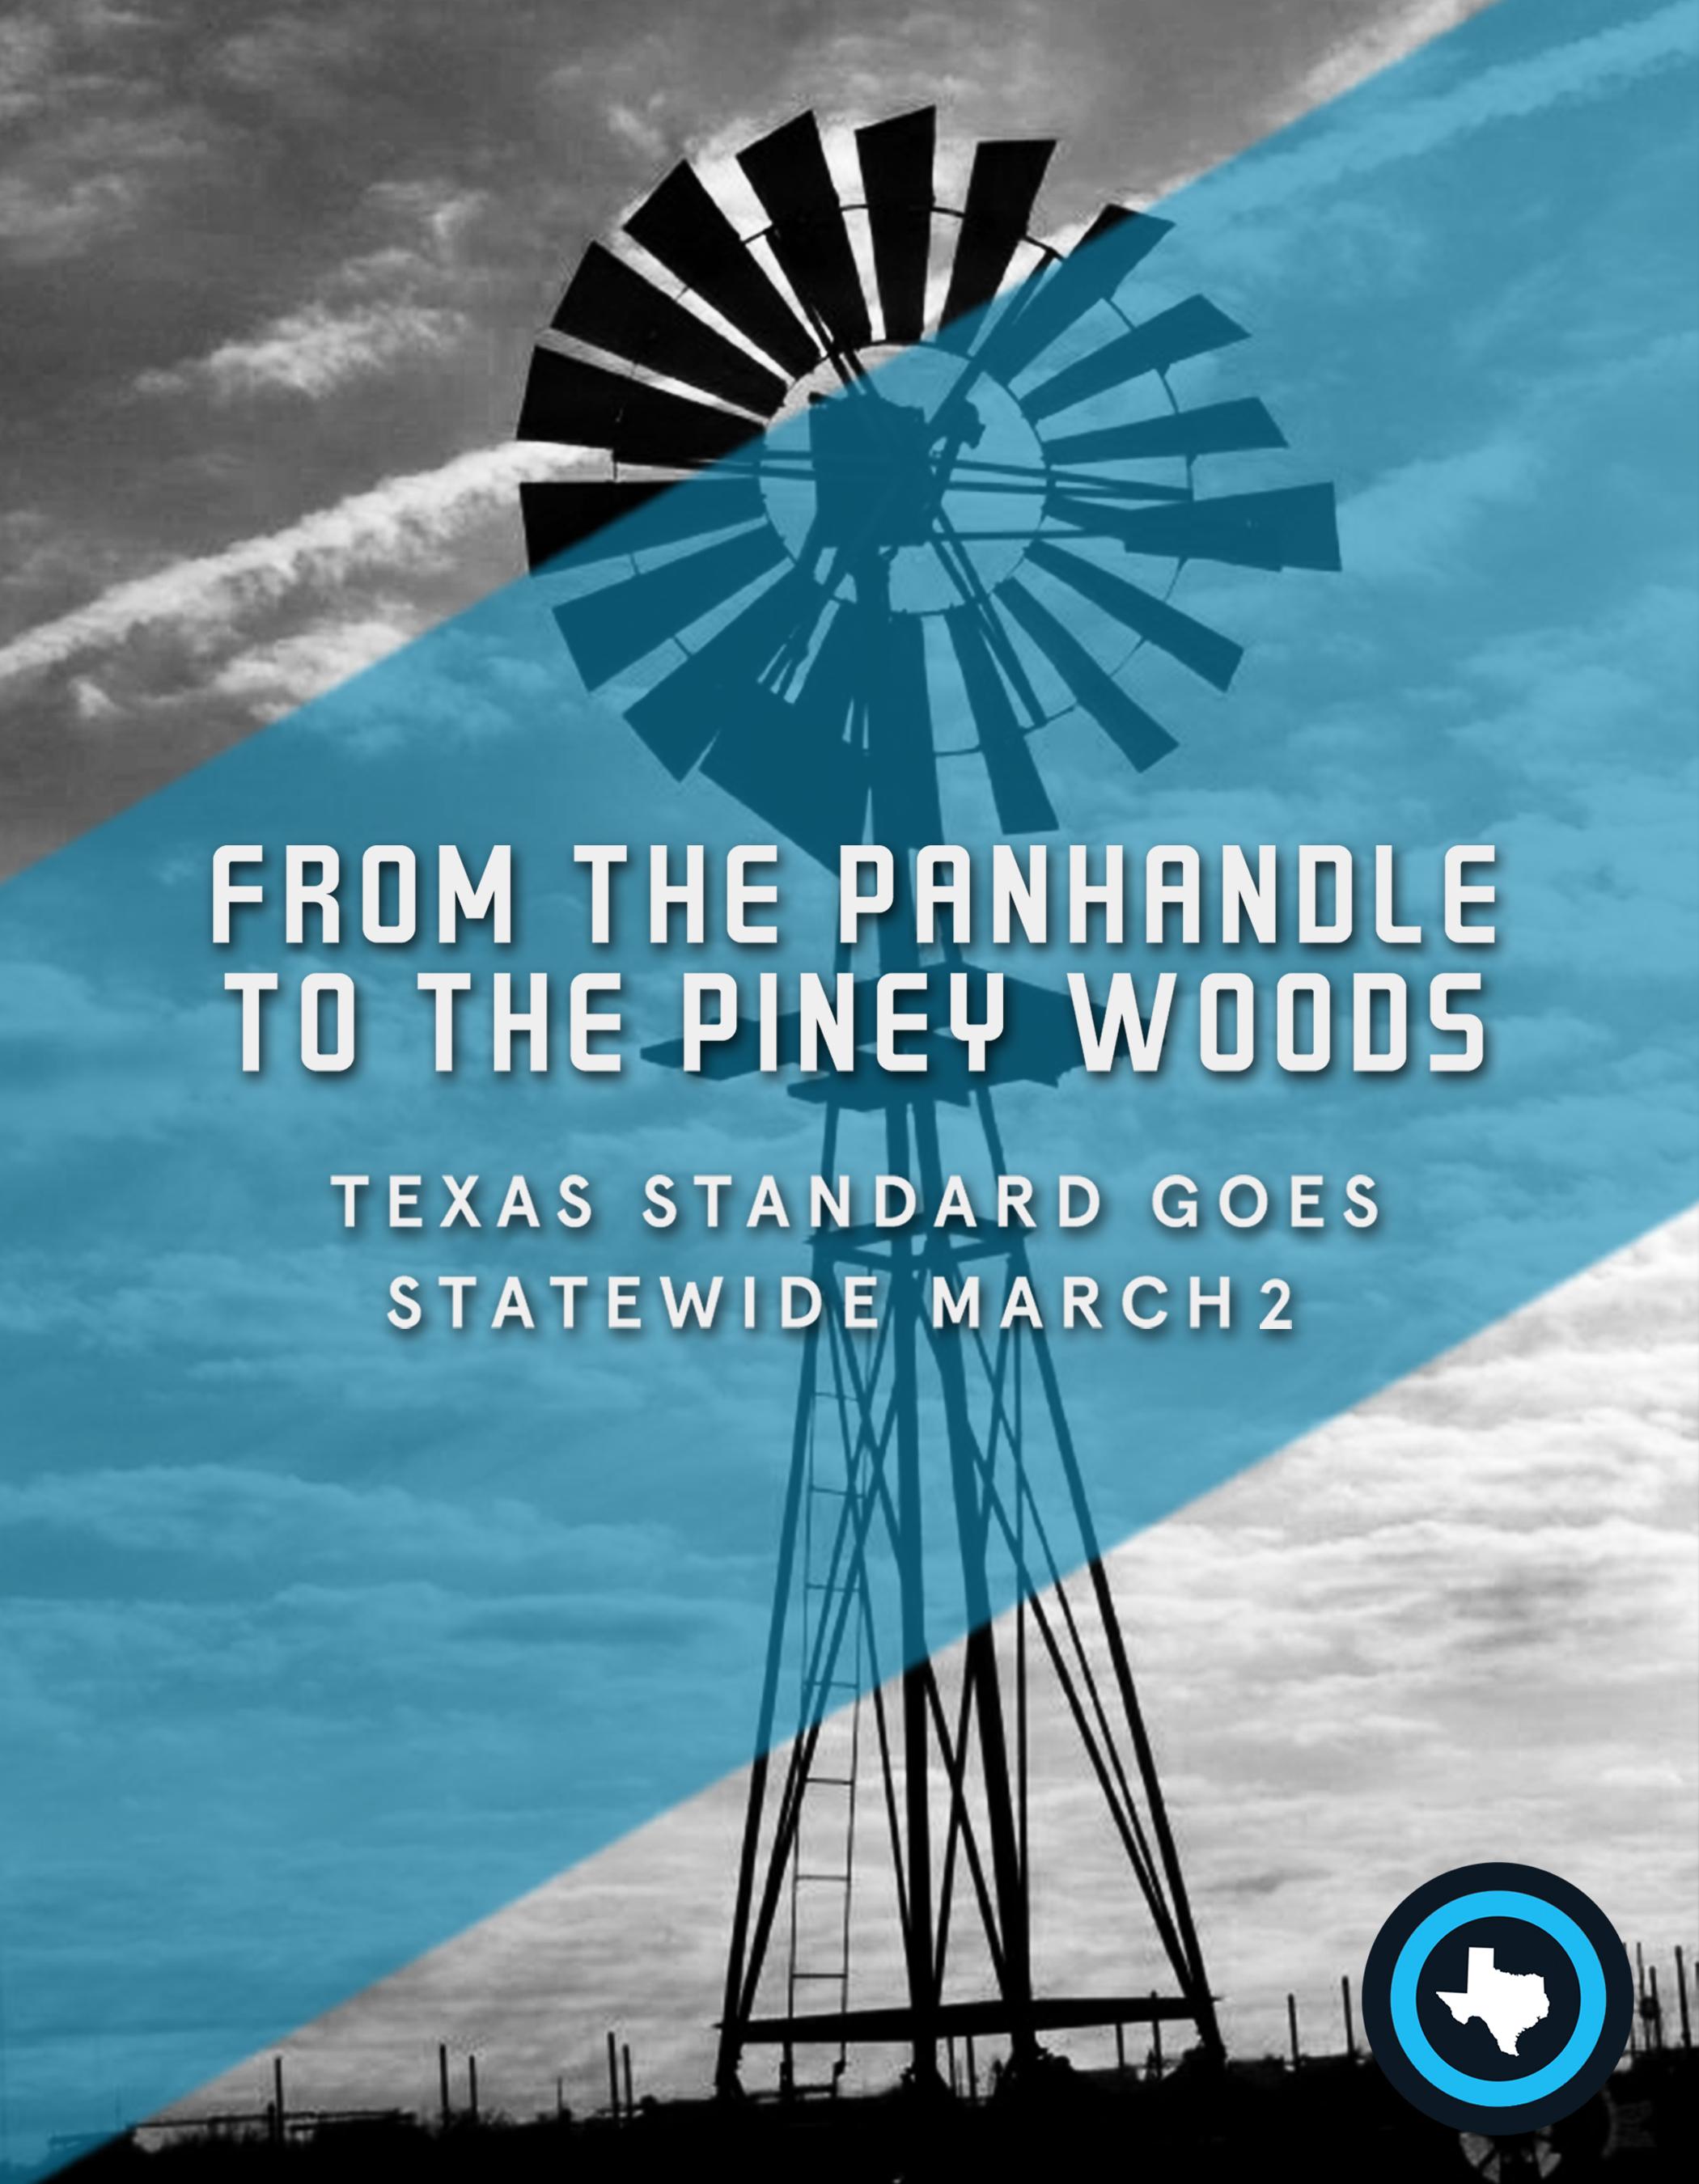 TexasStandard_findyourstation_Windmill_Prep.jpg